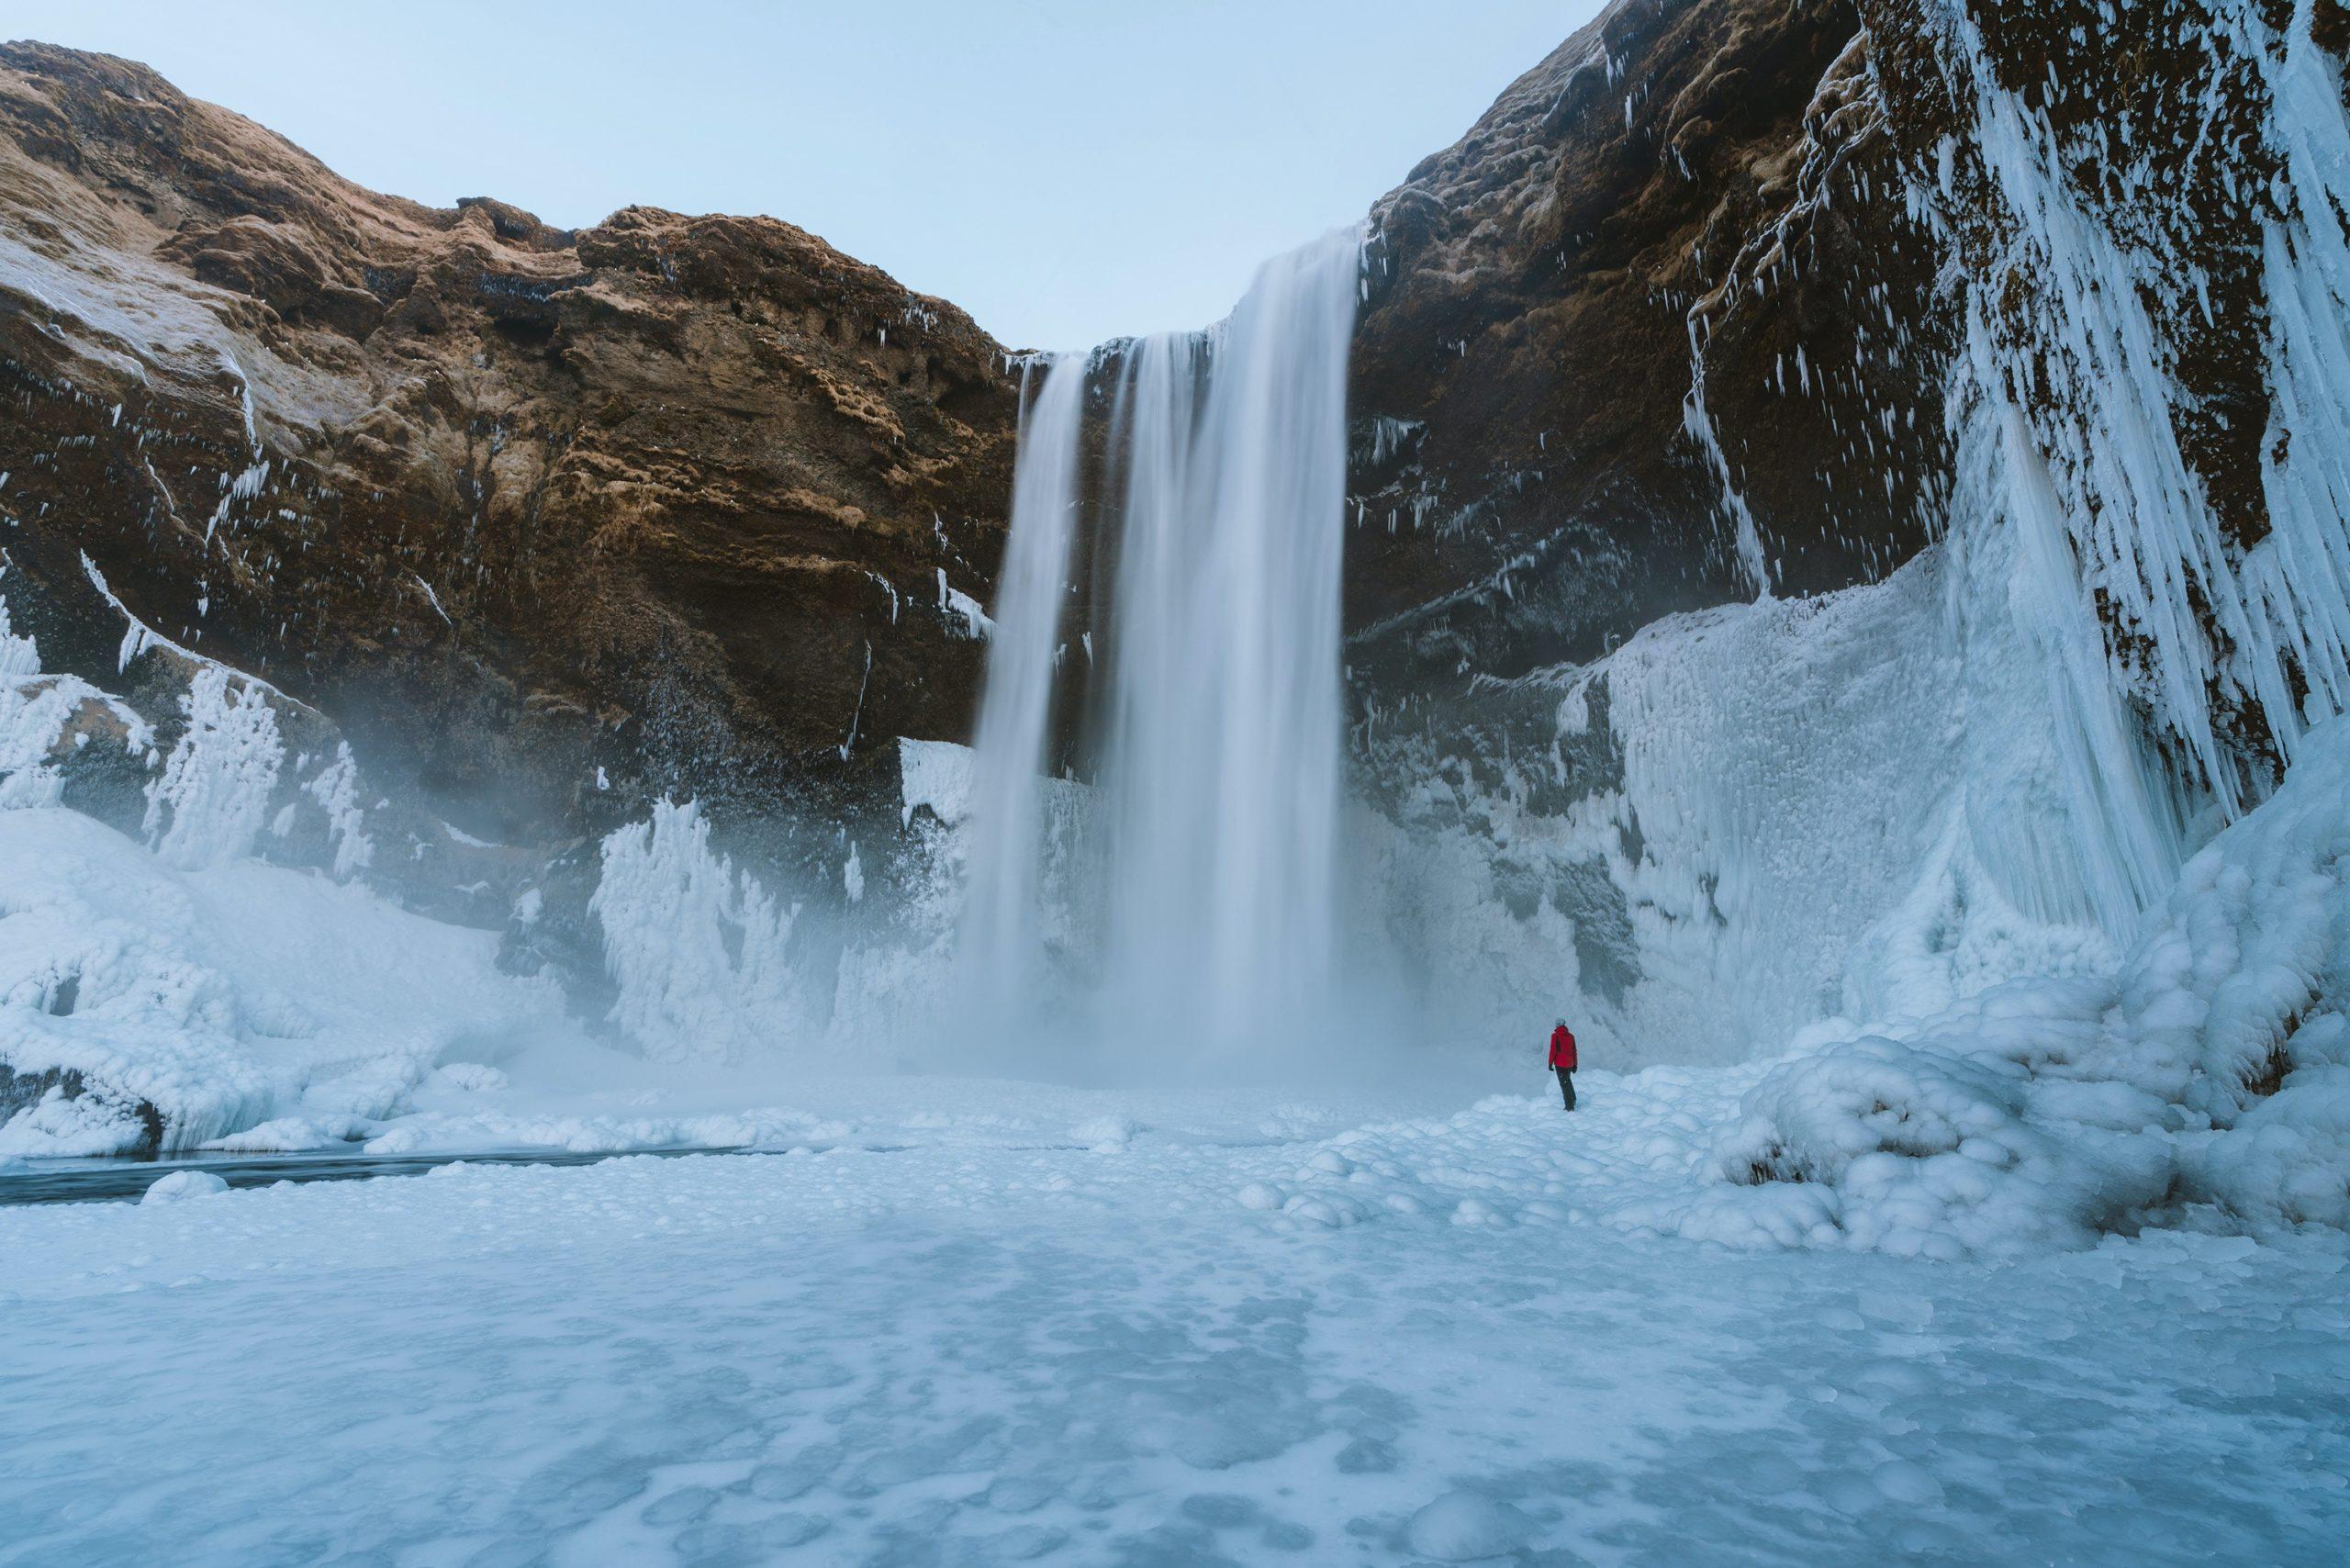 Unique honeymoon ideas - Chasing waterfalls in Iceland